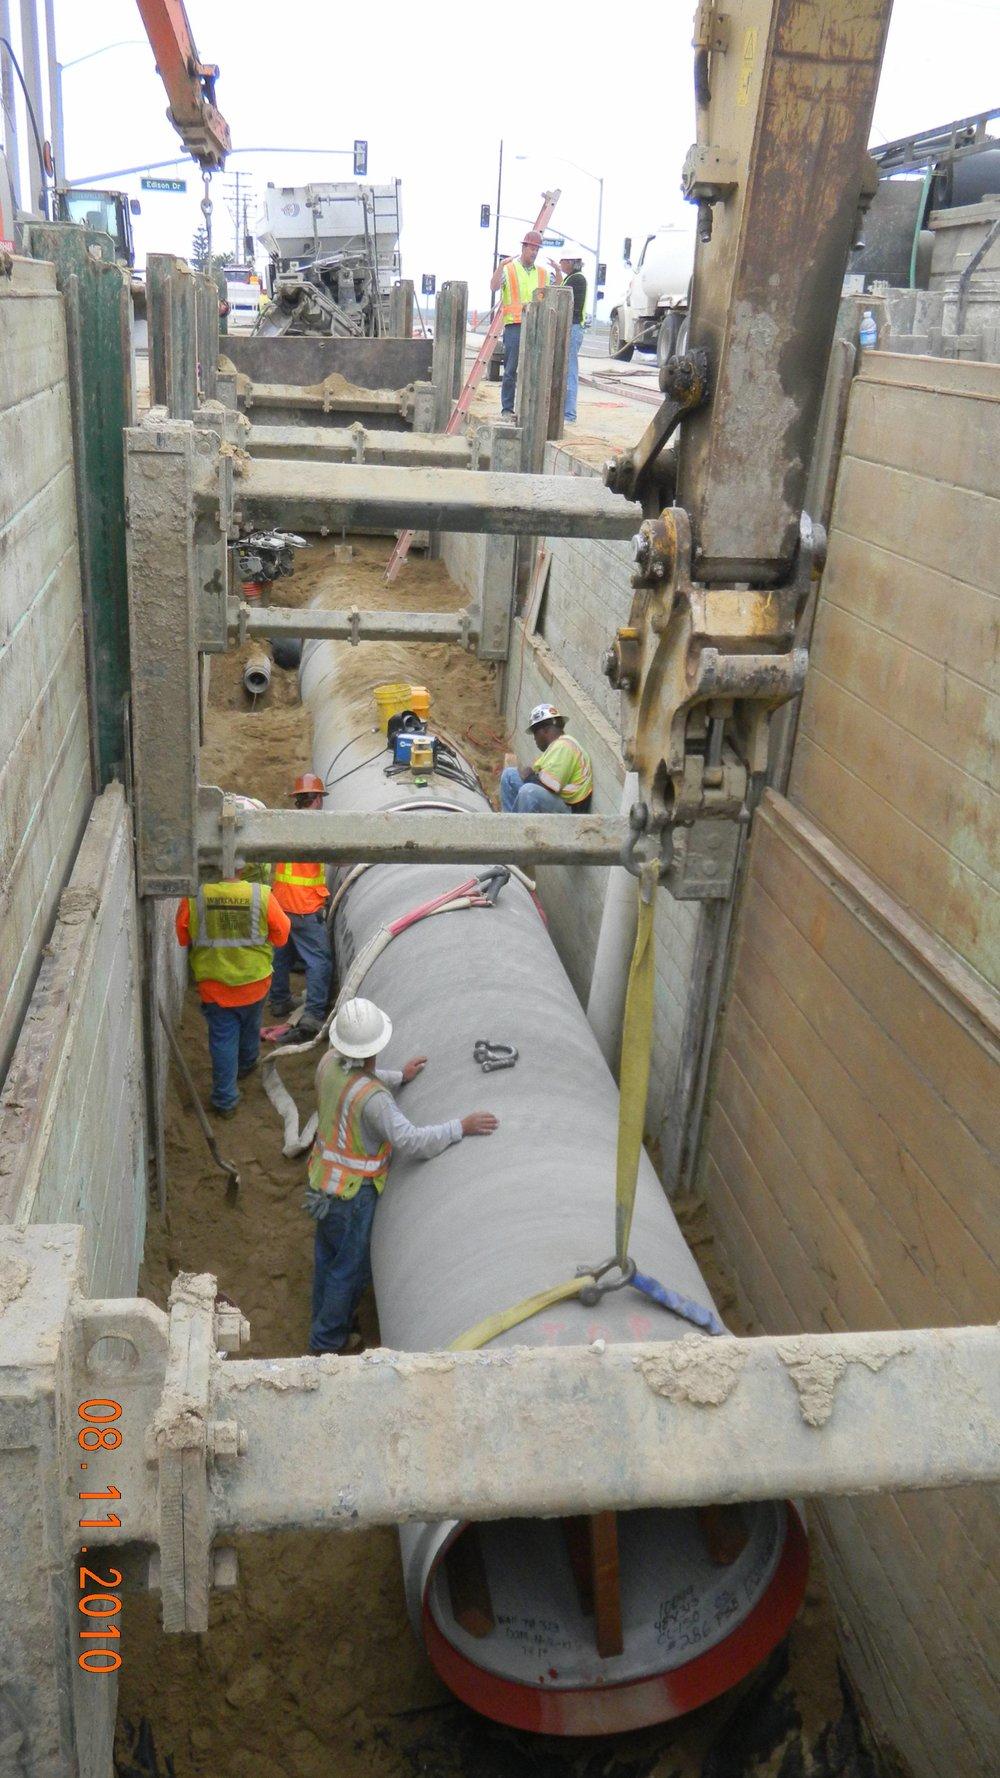 Water Line - Oxnard CA - Whitaker Group N01.JPG